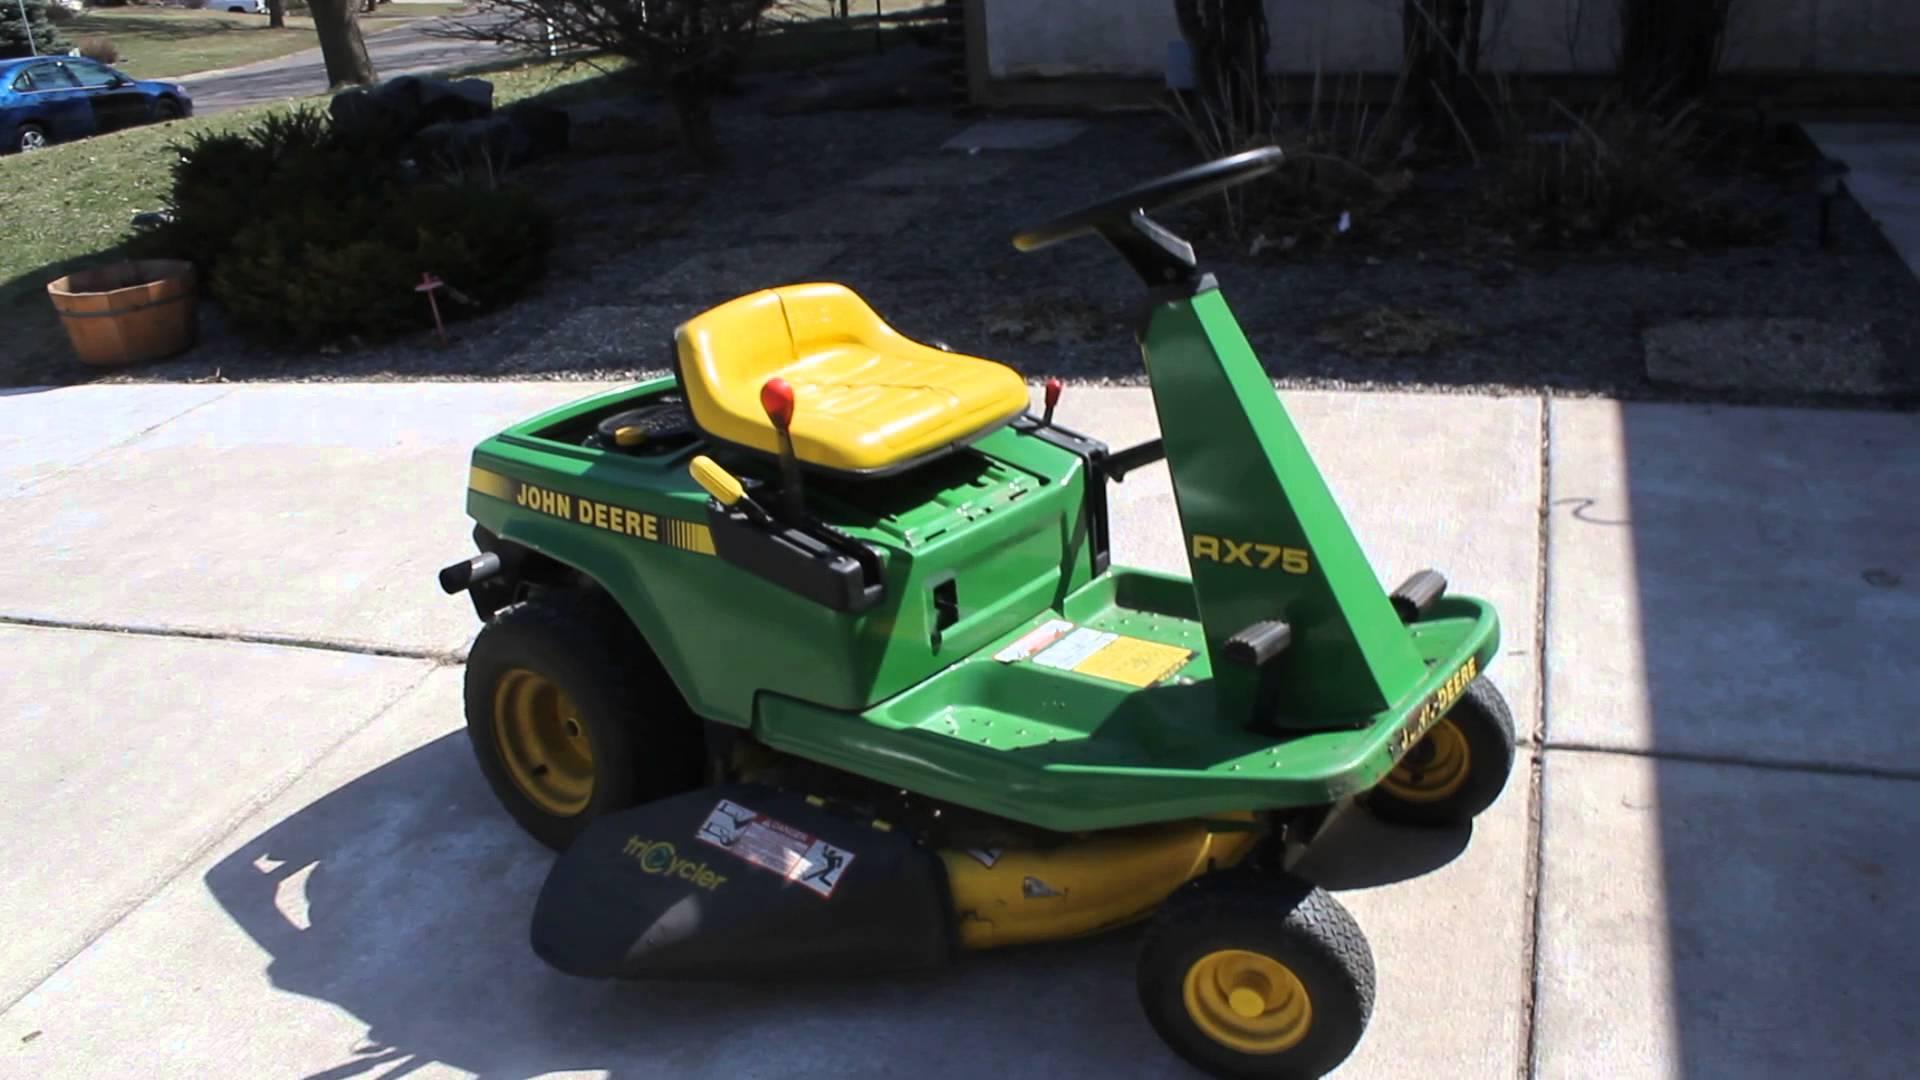 John Deere Rx75 Riding Mower Mowers Lawn Wiring Diagram Tractor Blue Book